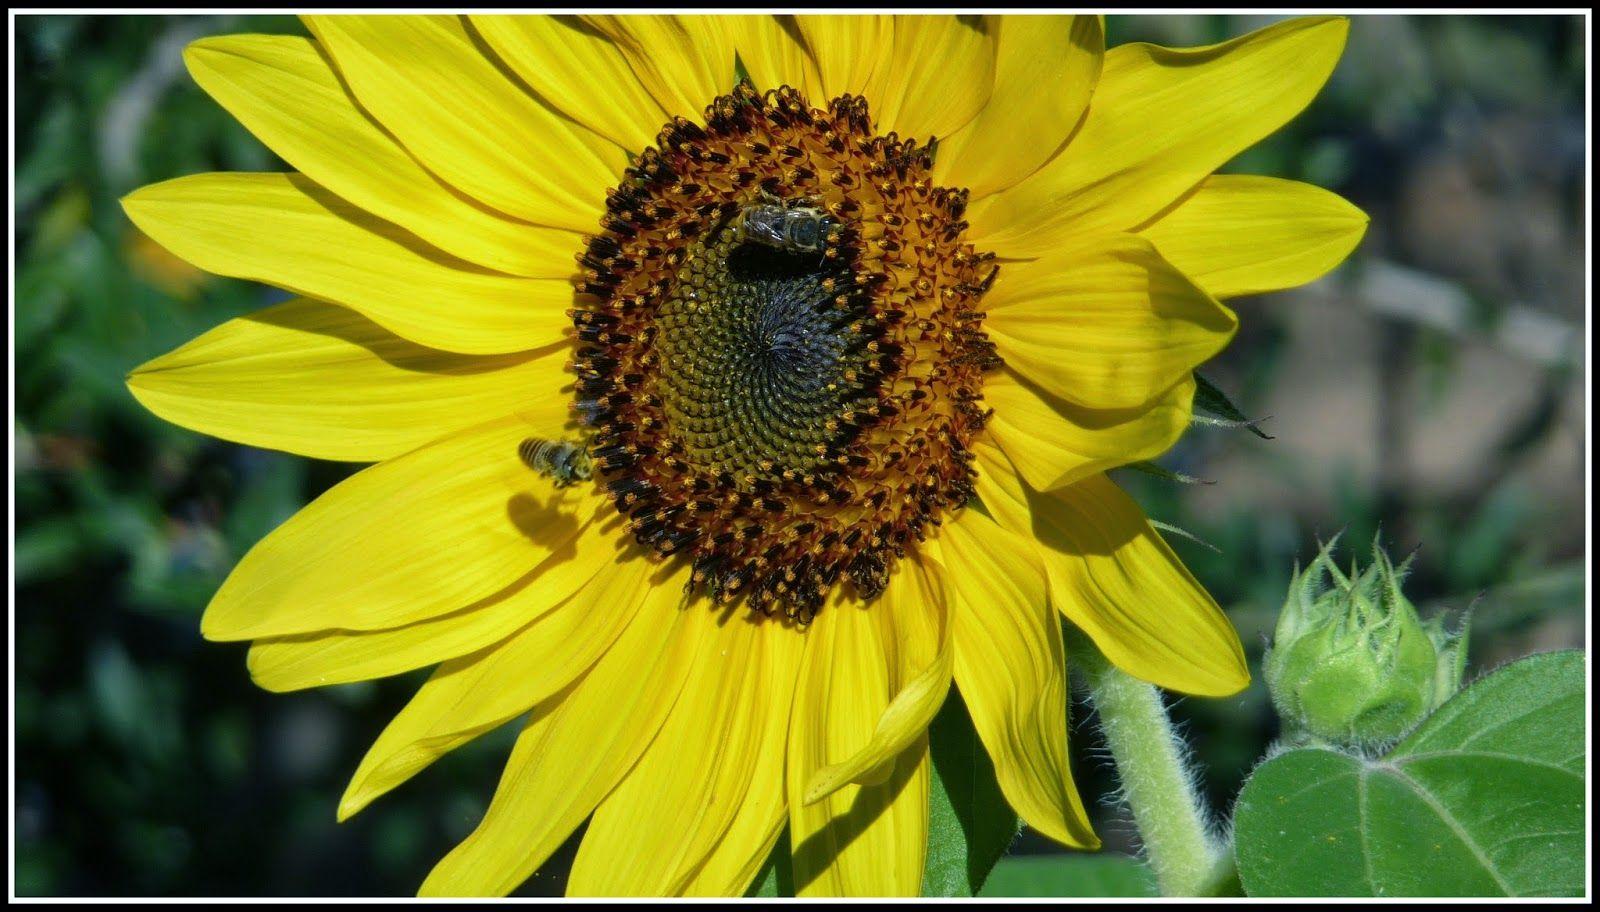 la fame delle api